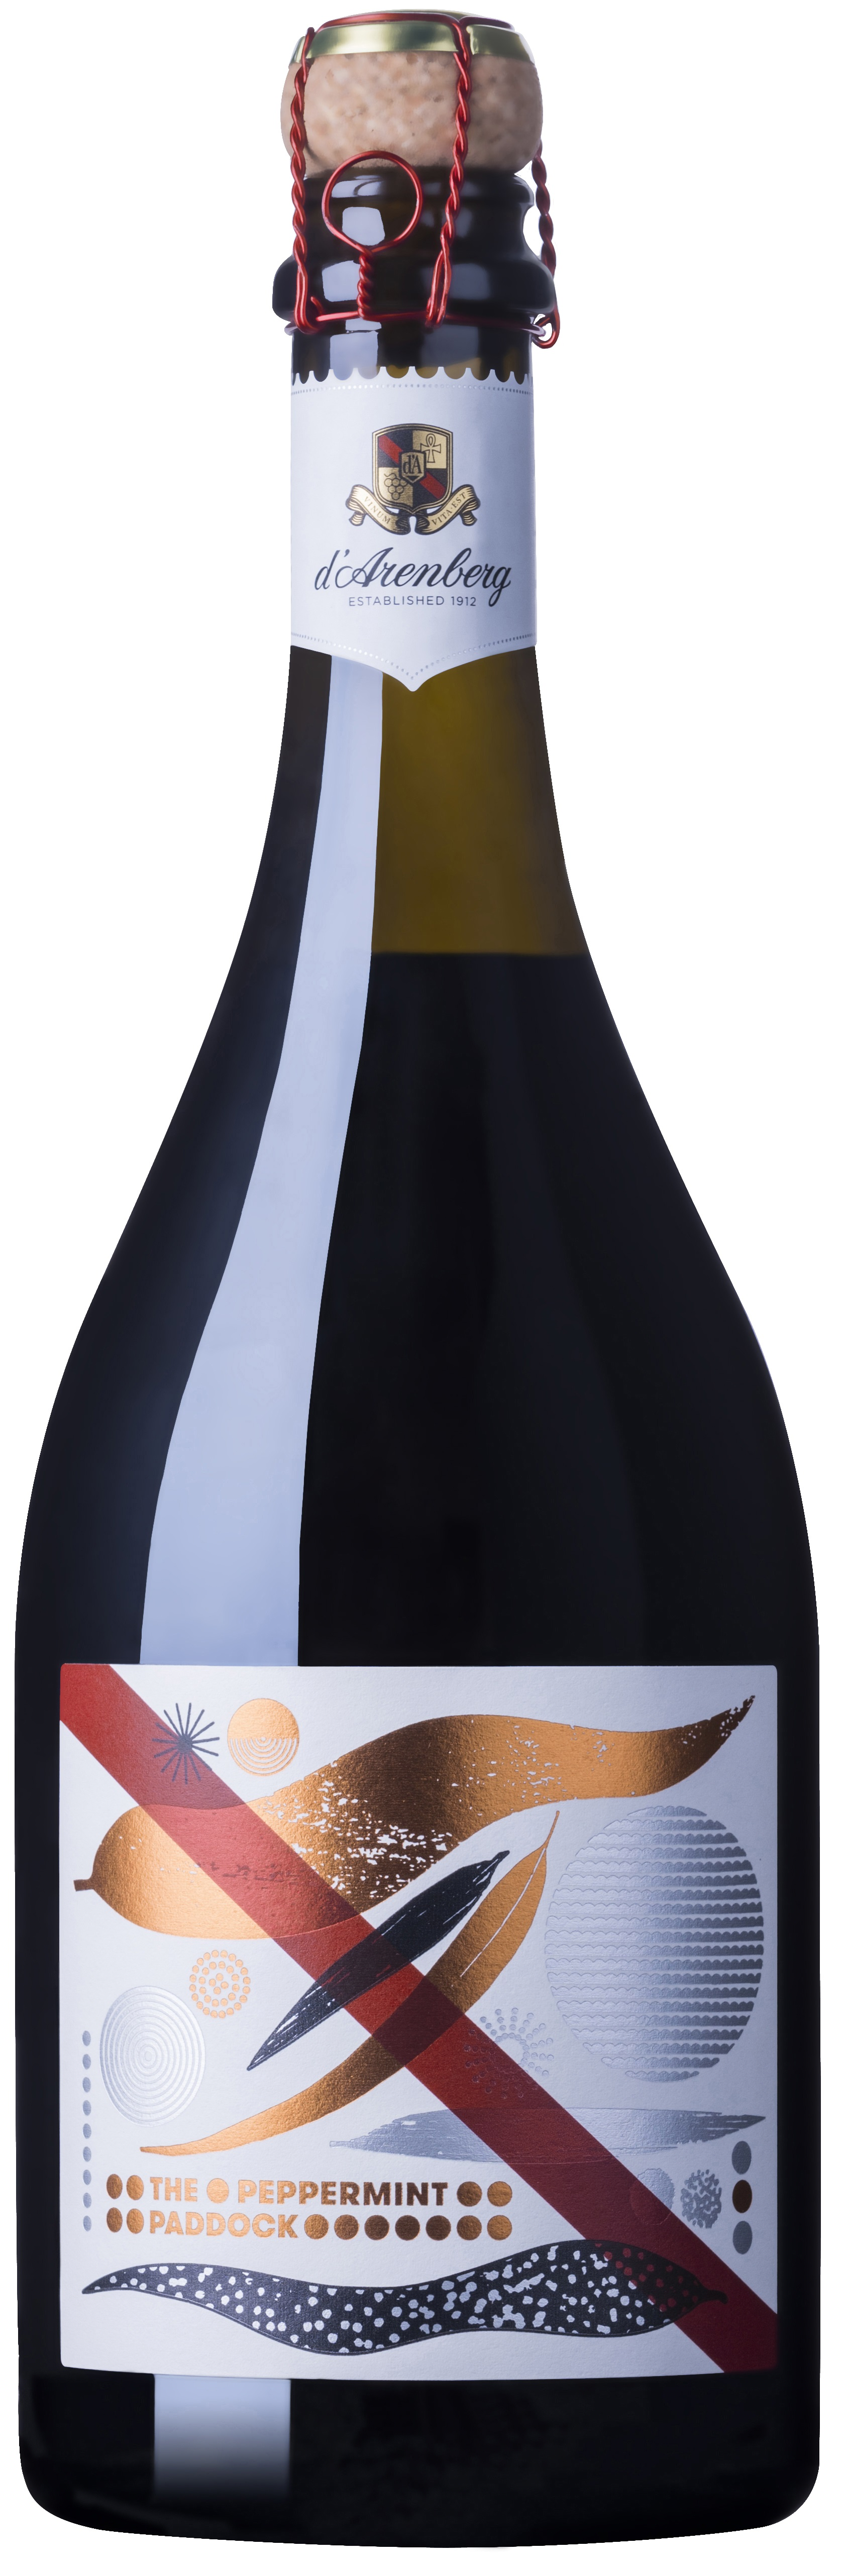 https://vinocorpperu.com/images/vinos/darenberg/the_peppermint_paddock_chambourcin_graciano.jpg